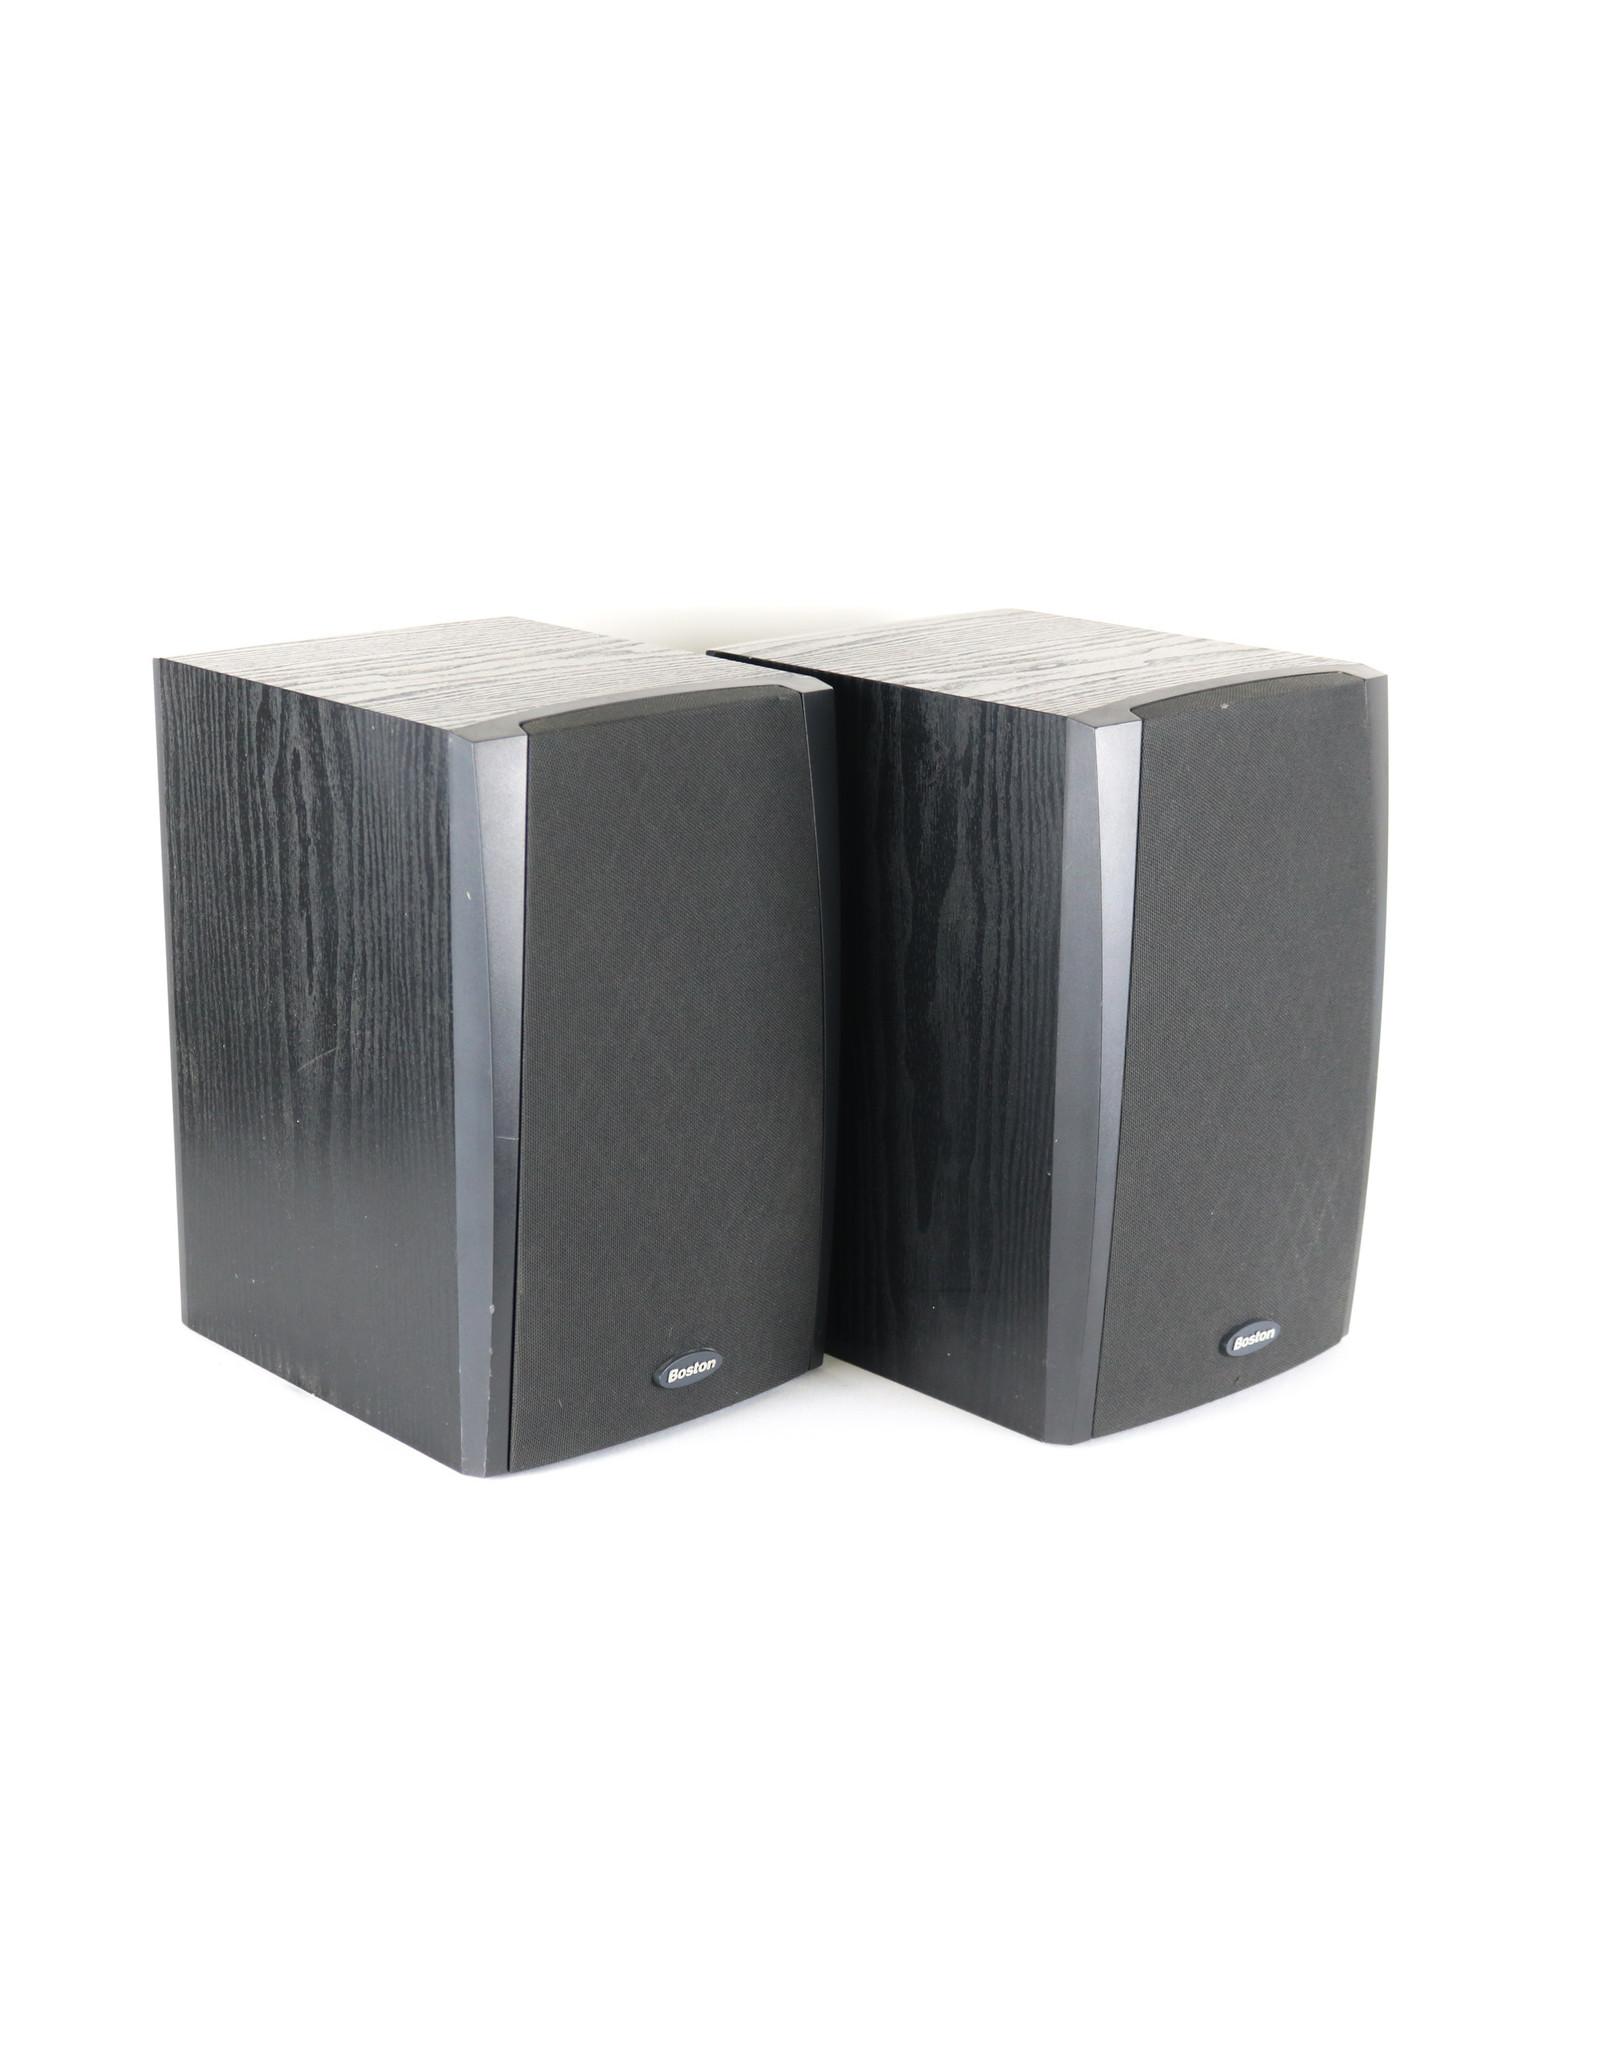 Boston Acoustics Boston CR75 Bookshelf Speakers USED